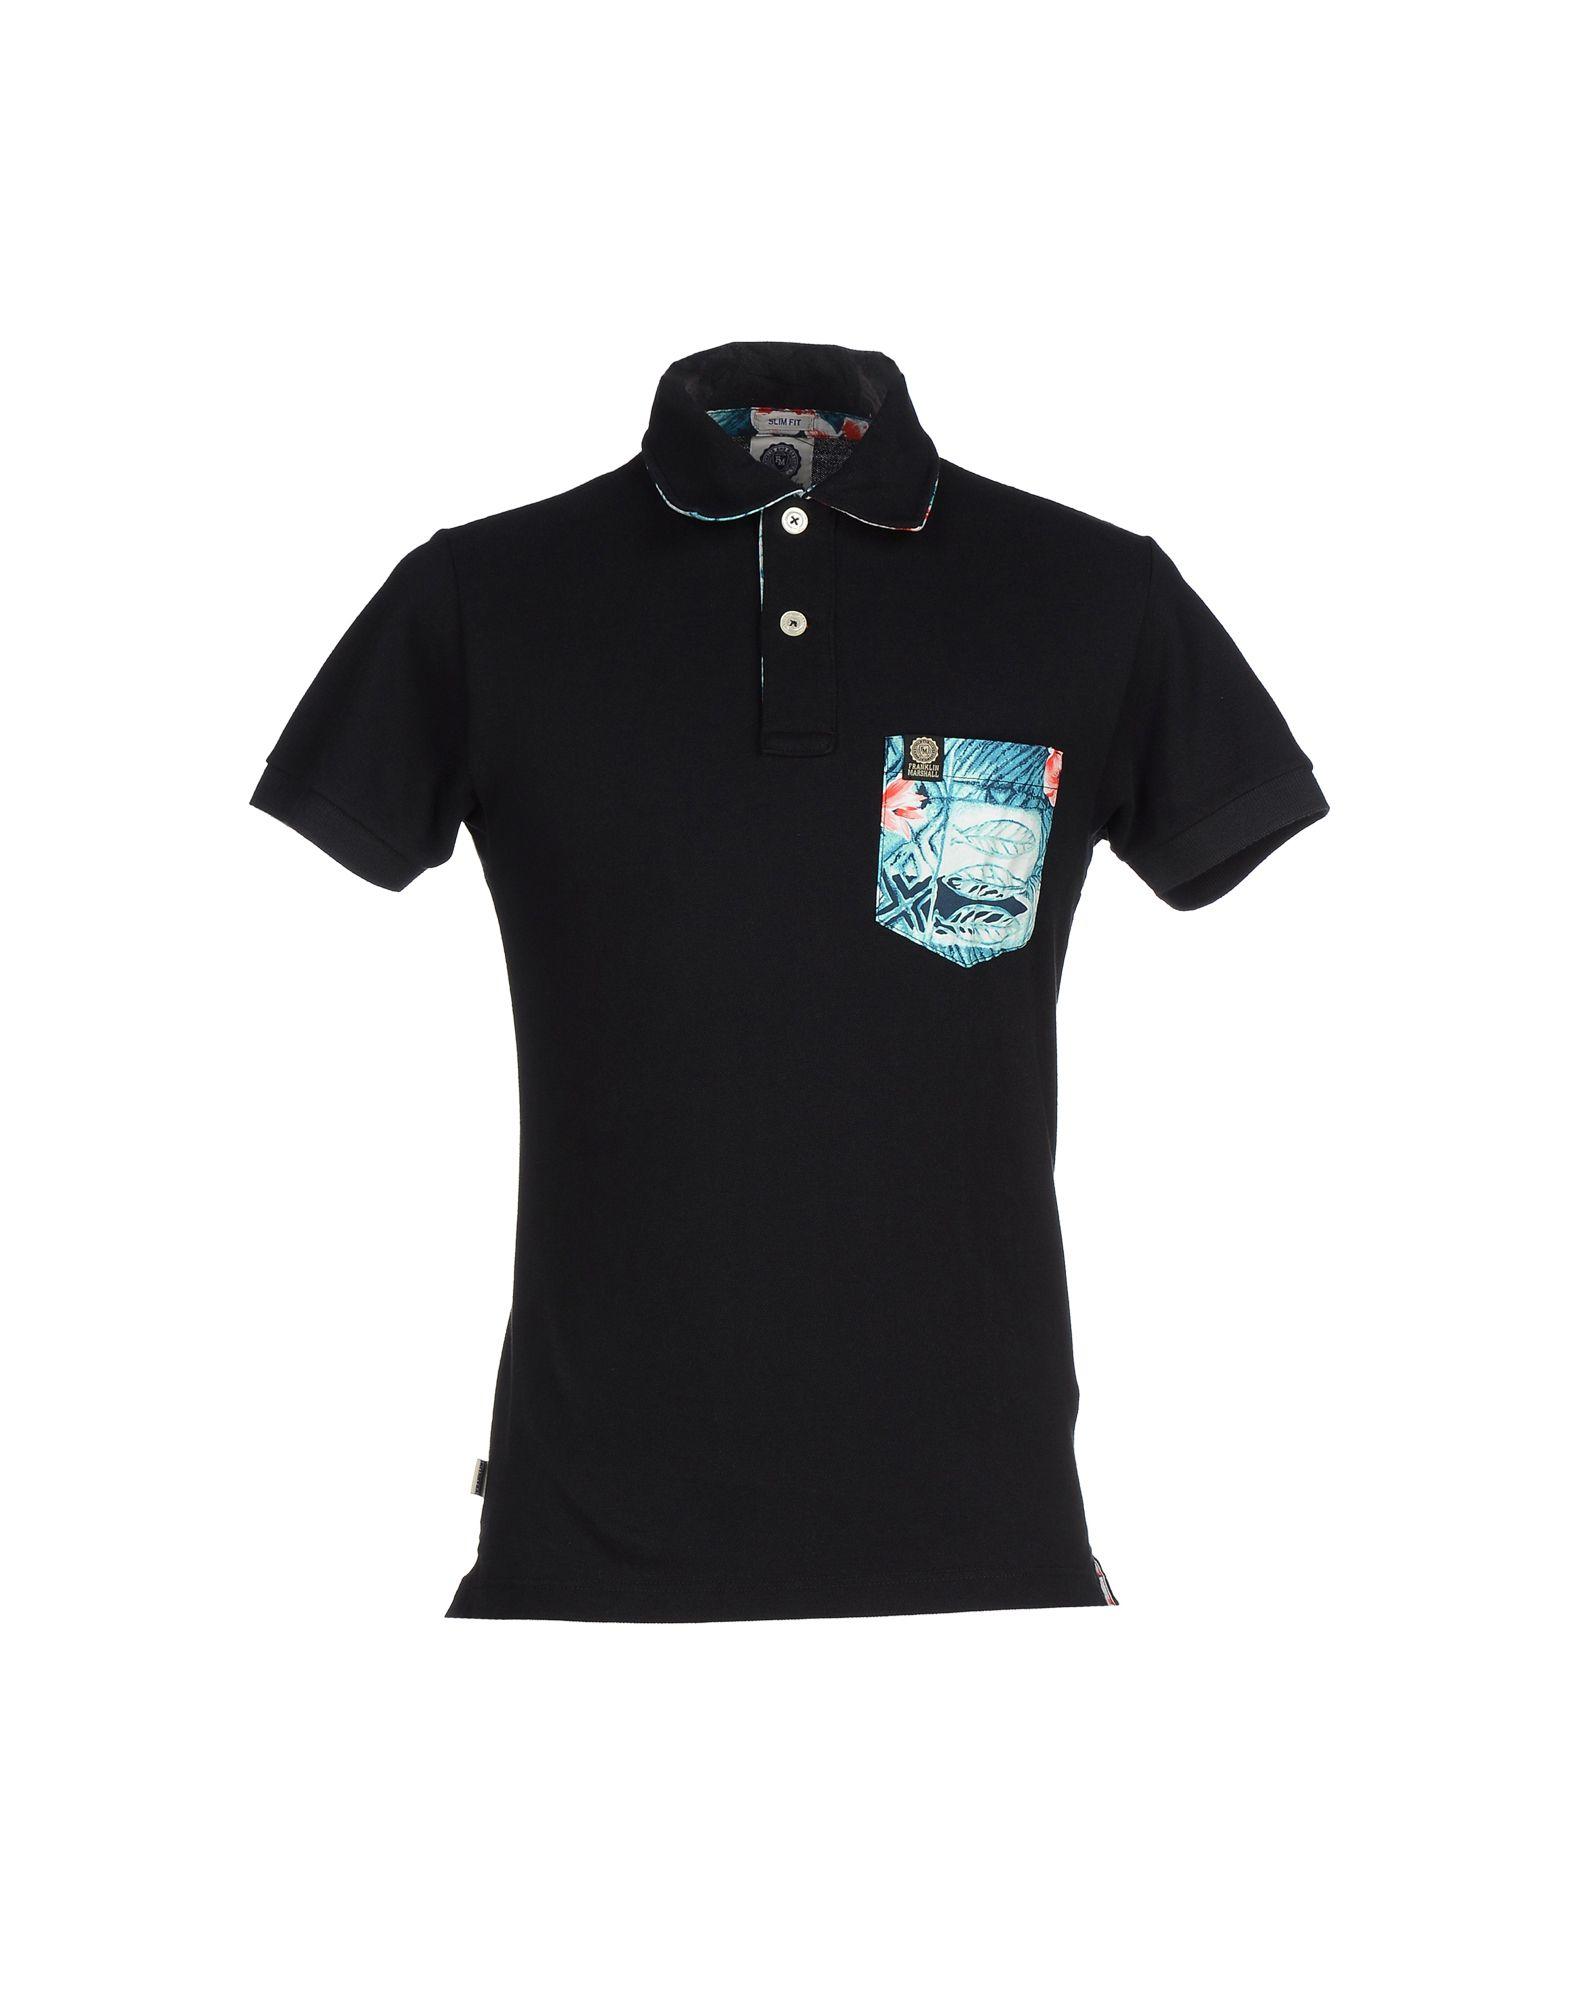 Franklin Marshall Polo Shirt In Black For Men Lyst